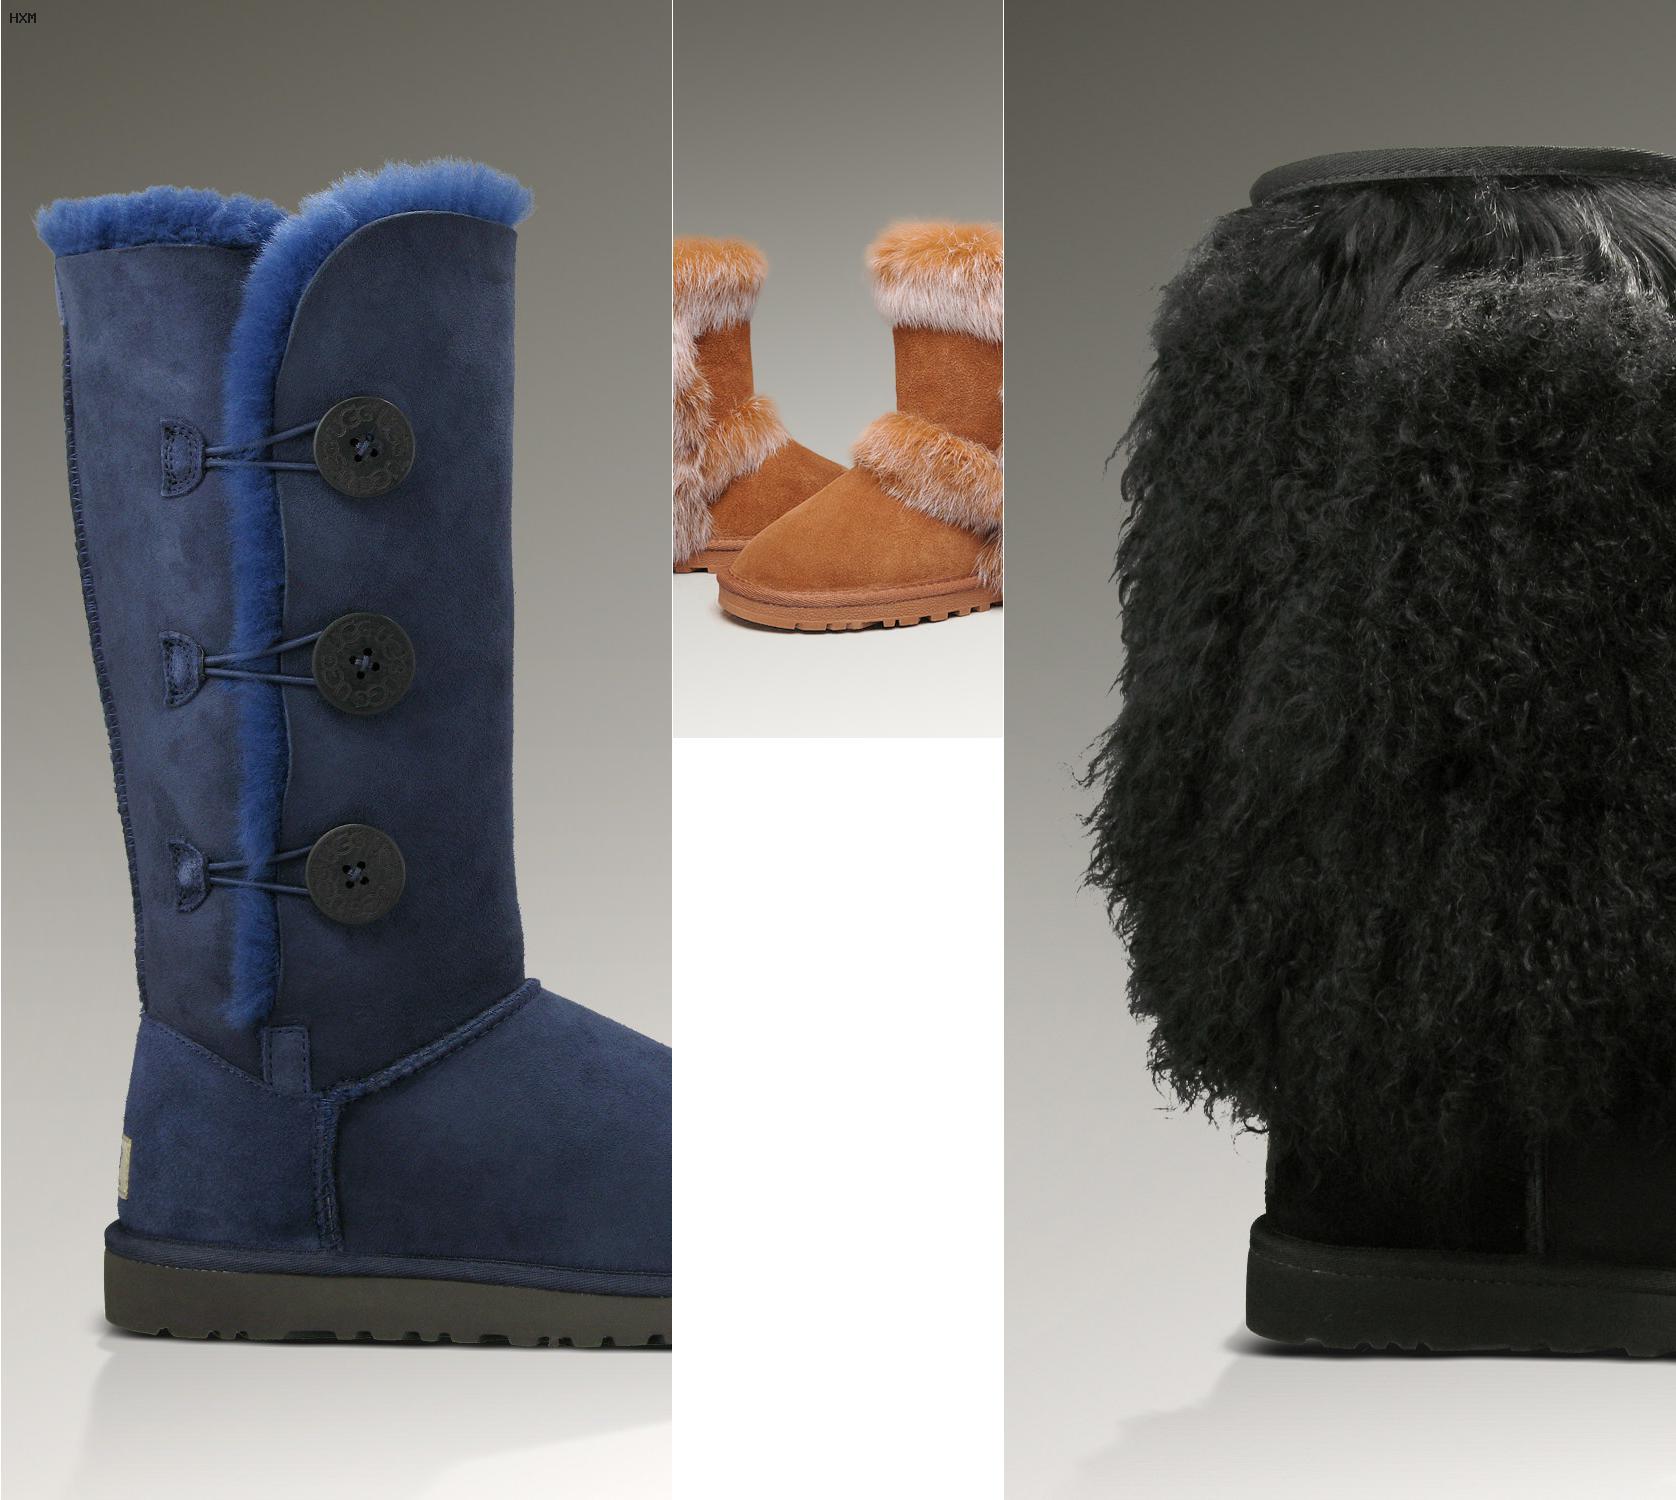 697d1f46b6a ugg boots sale 39 grau